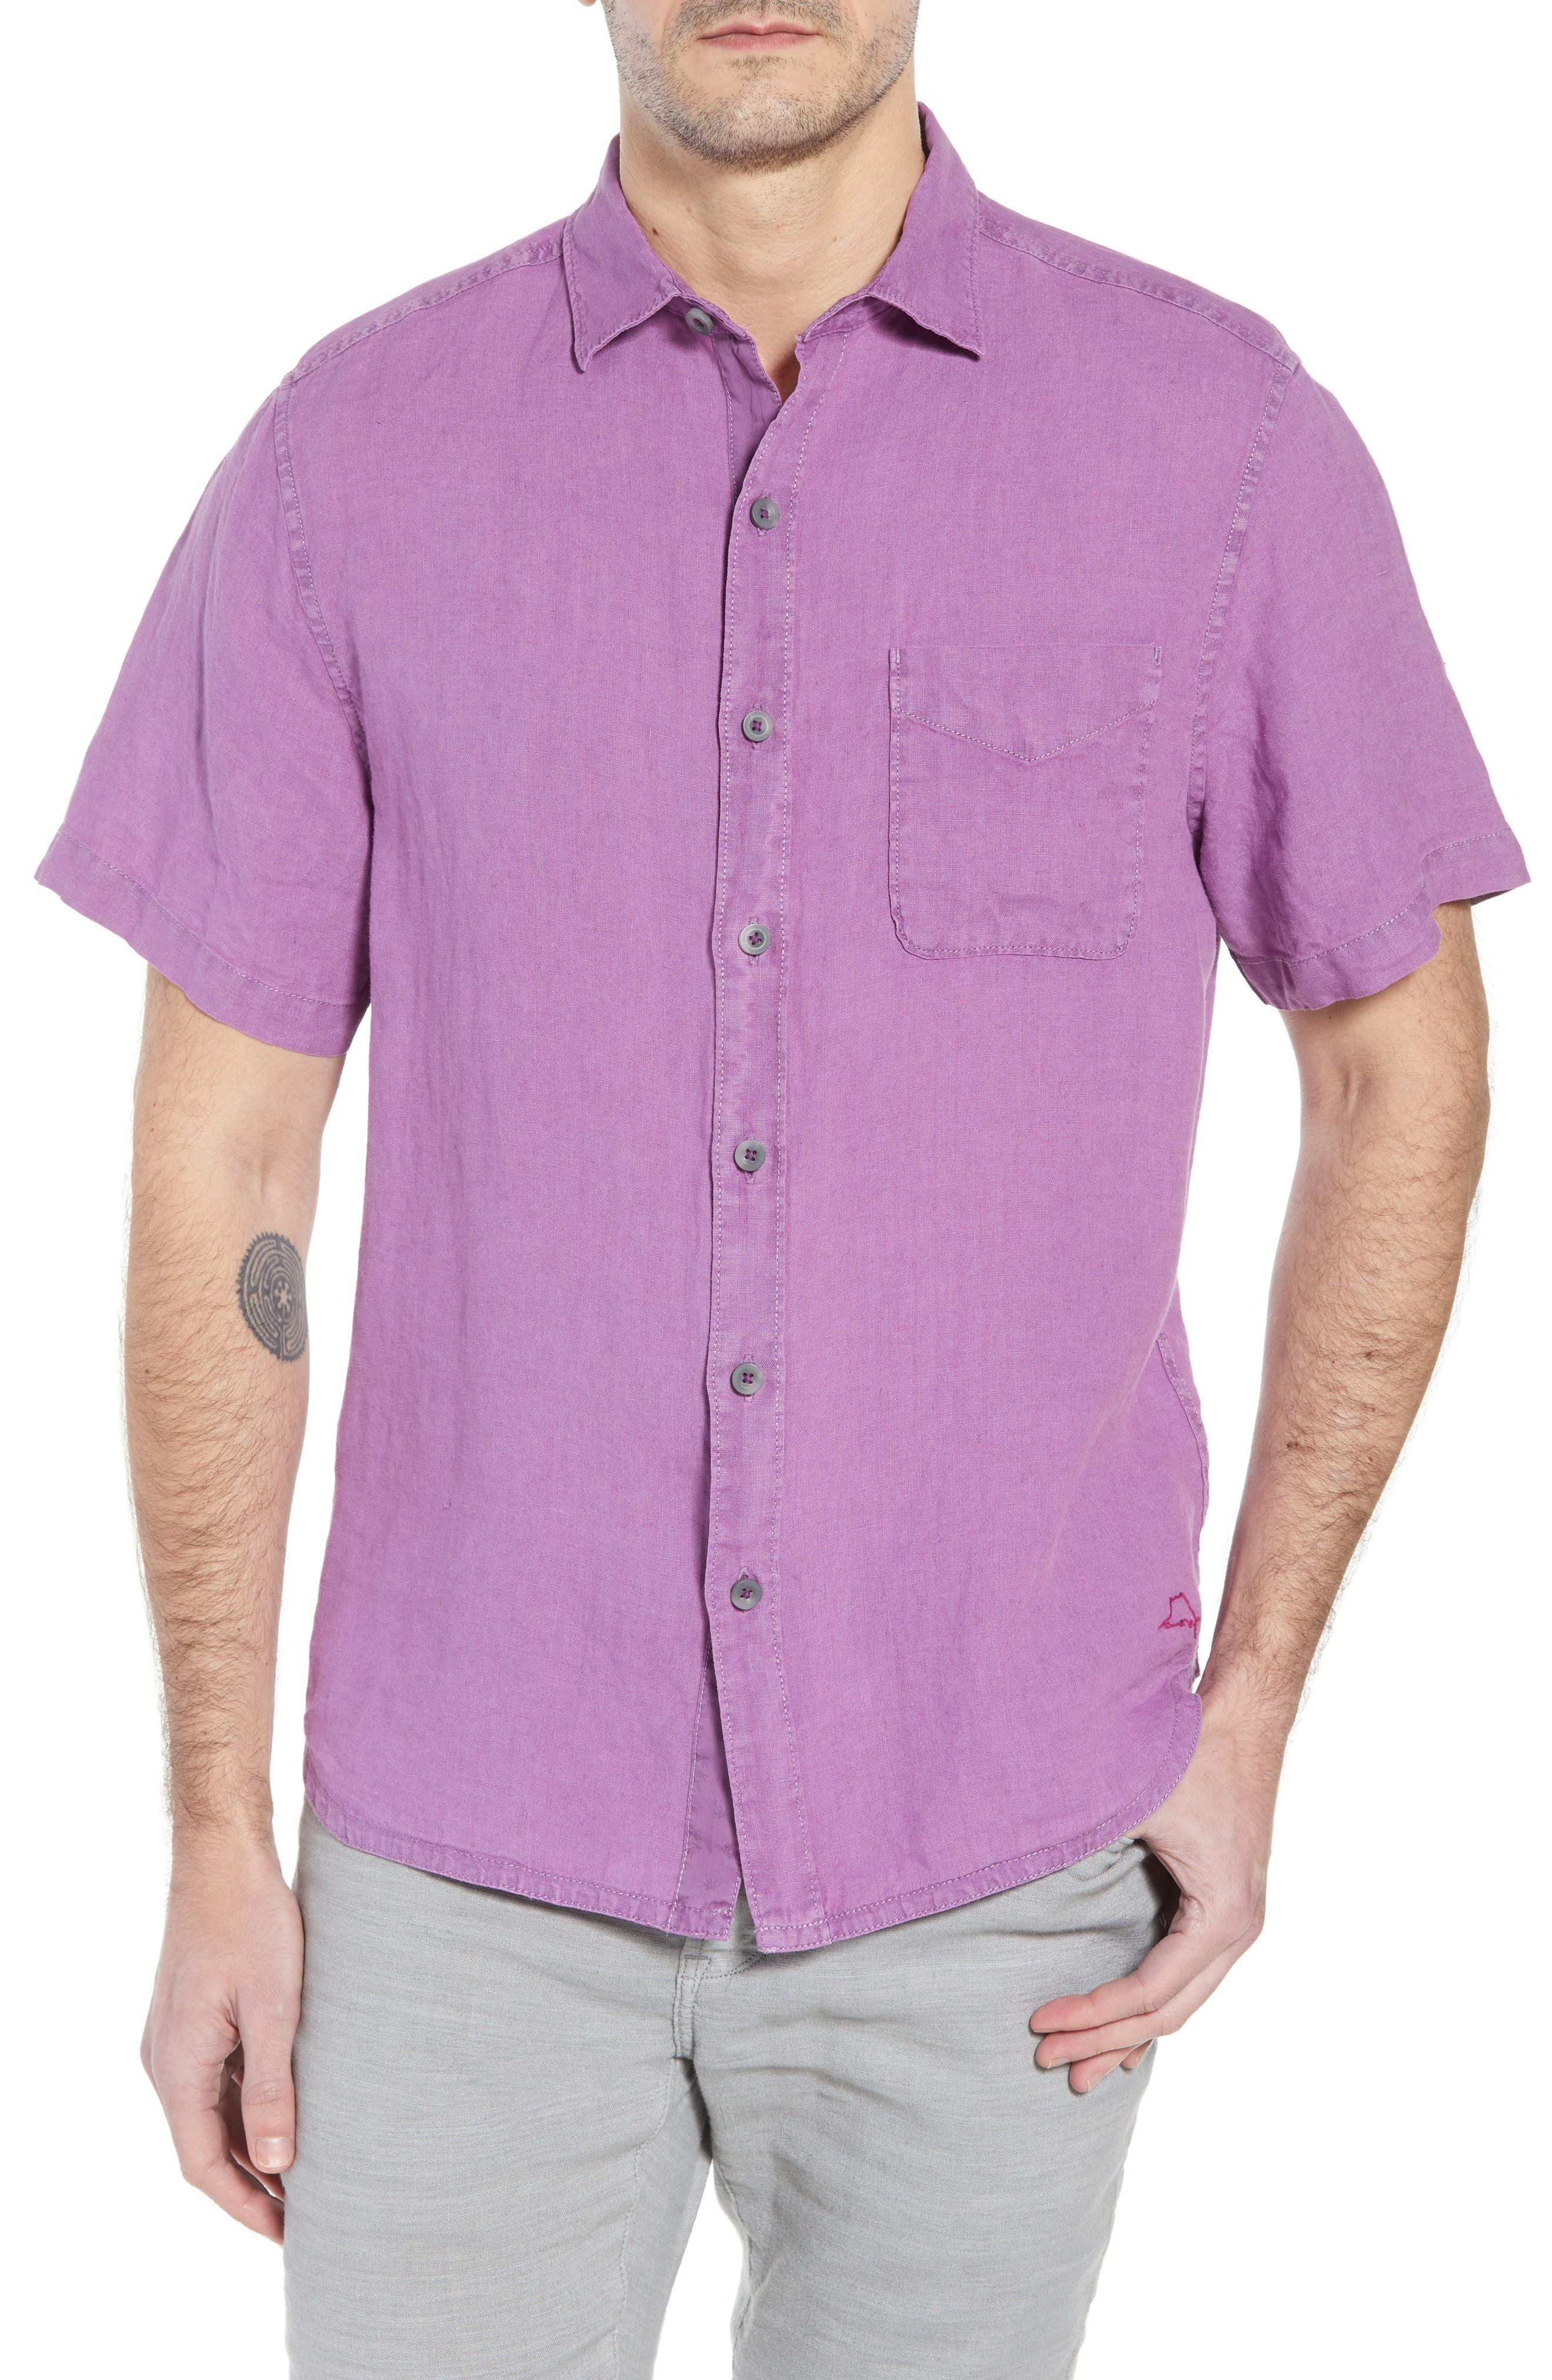 9ededd77 Tommy Bahama Seaspray Breezer Linen Sport Shirt In Sparkling Grape ...